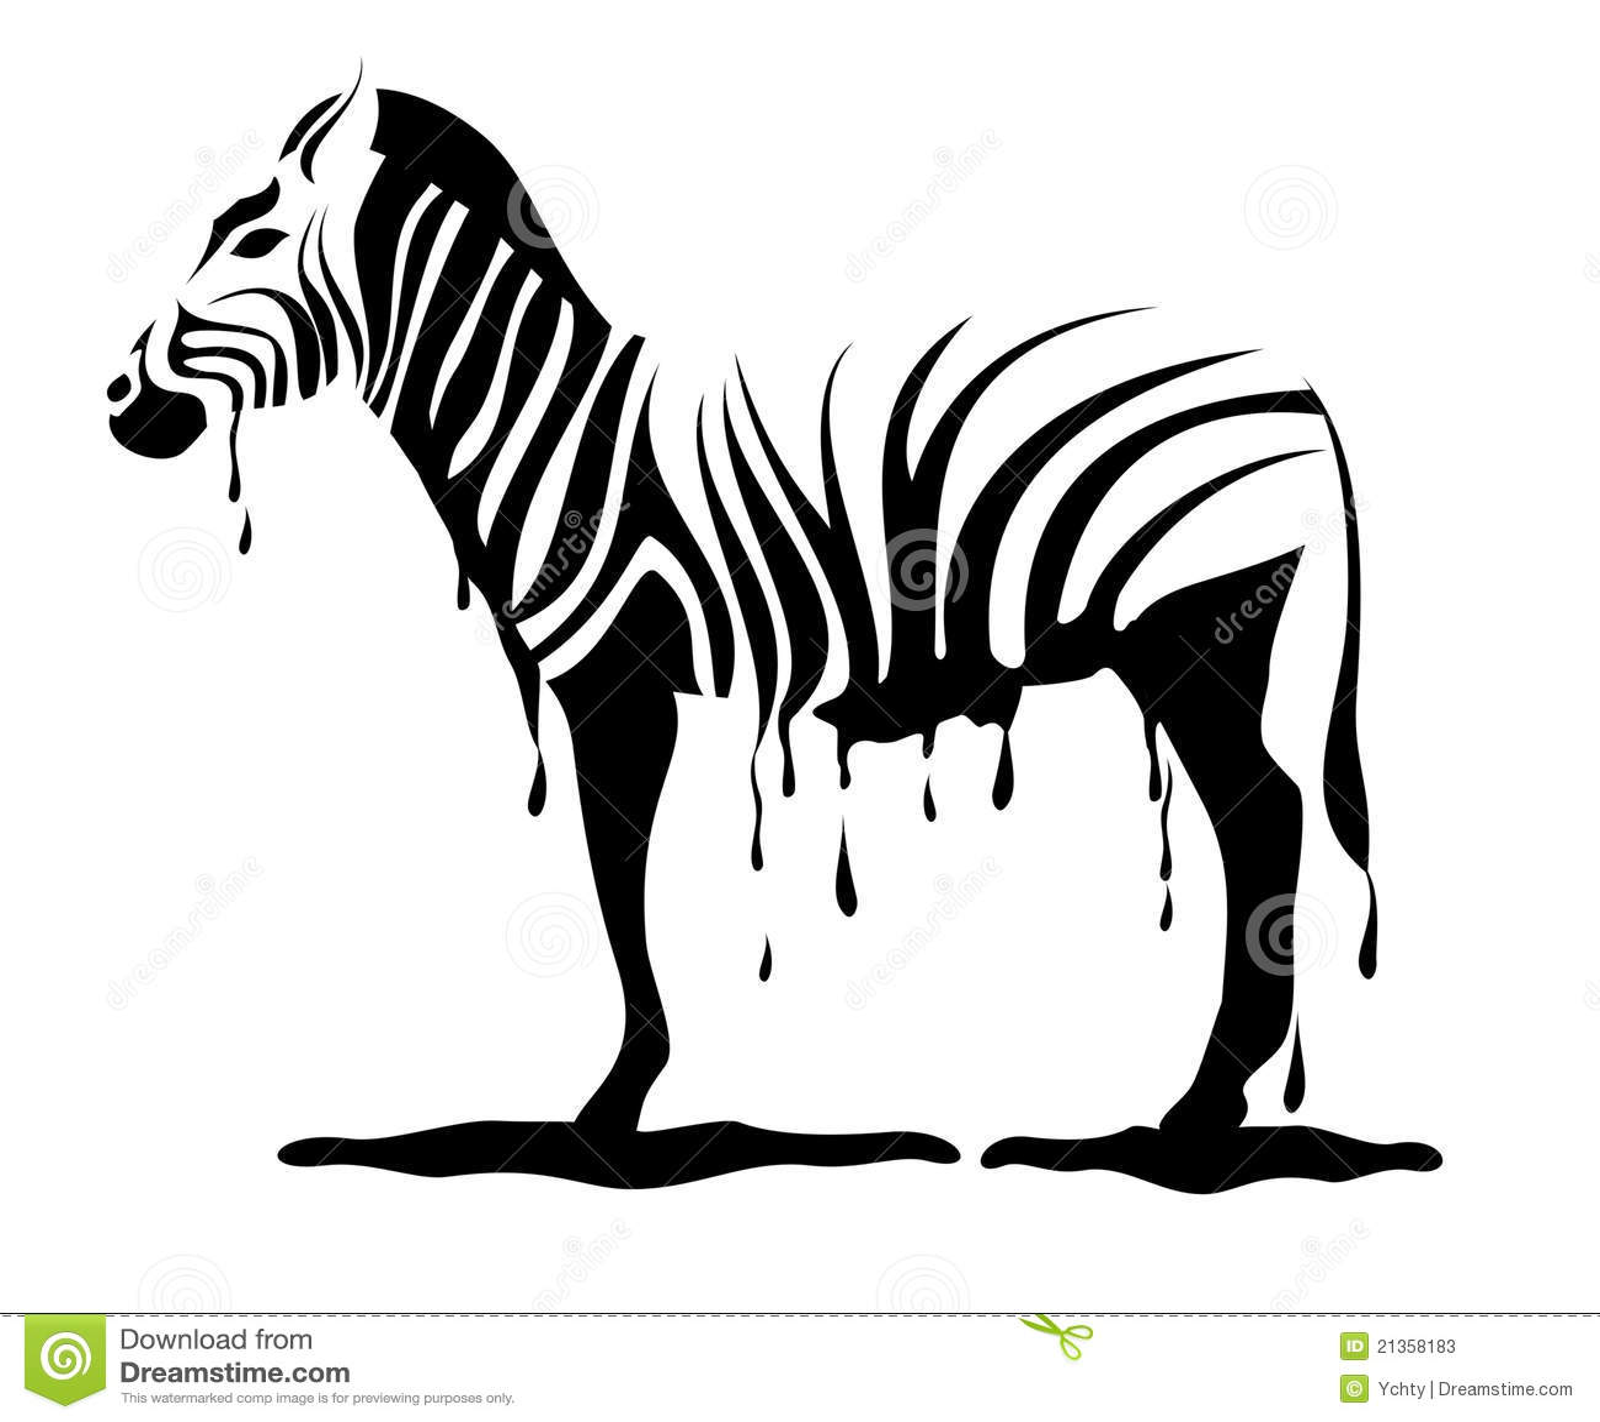 Zebra Loosing Its Stripes In Vector Stock Photos